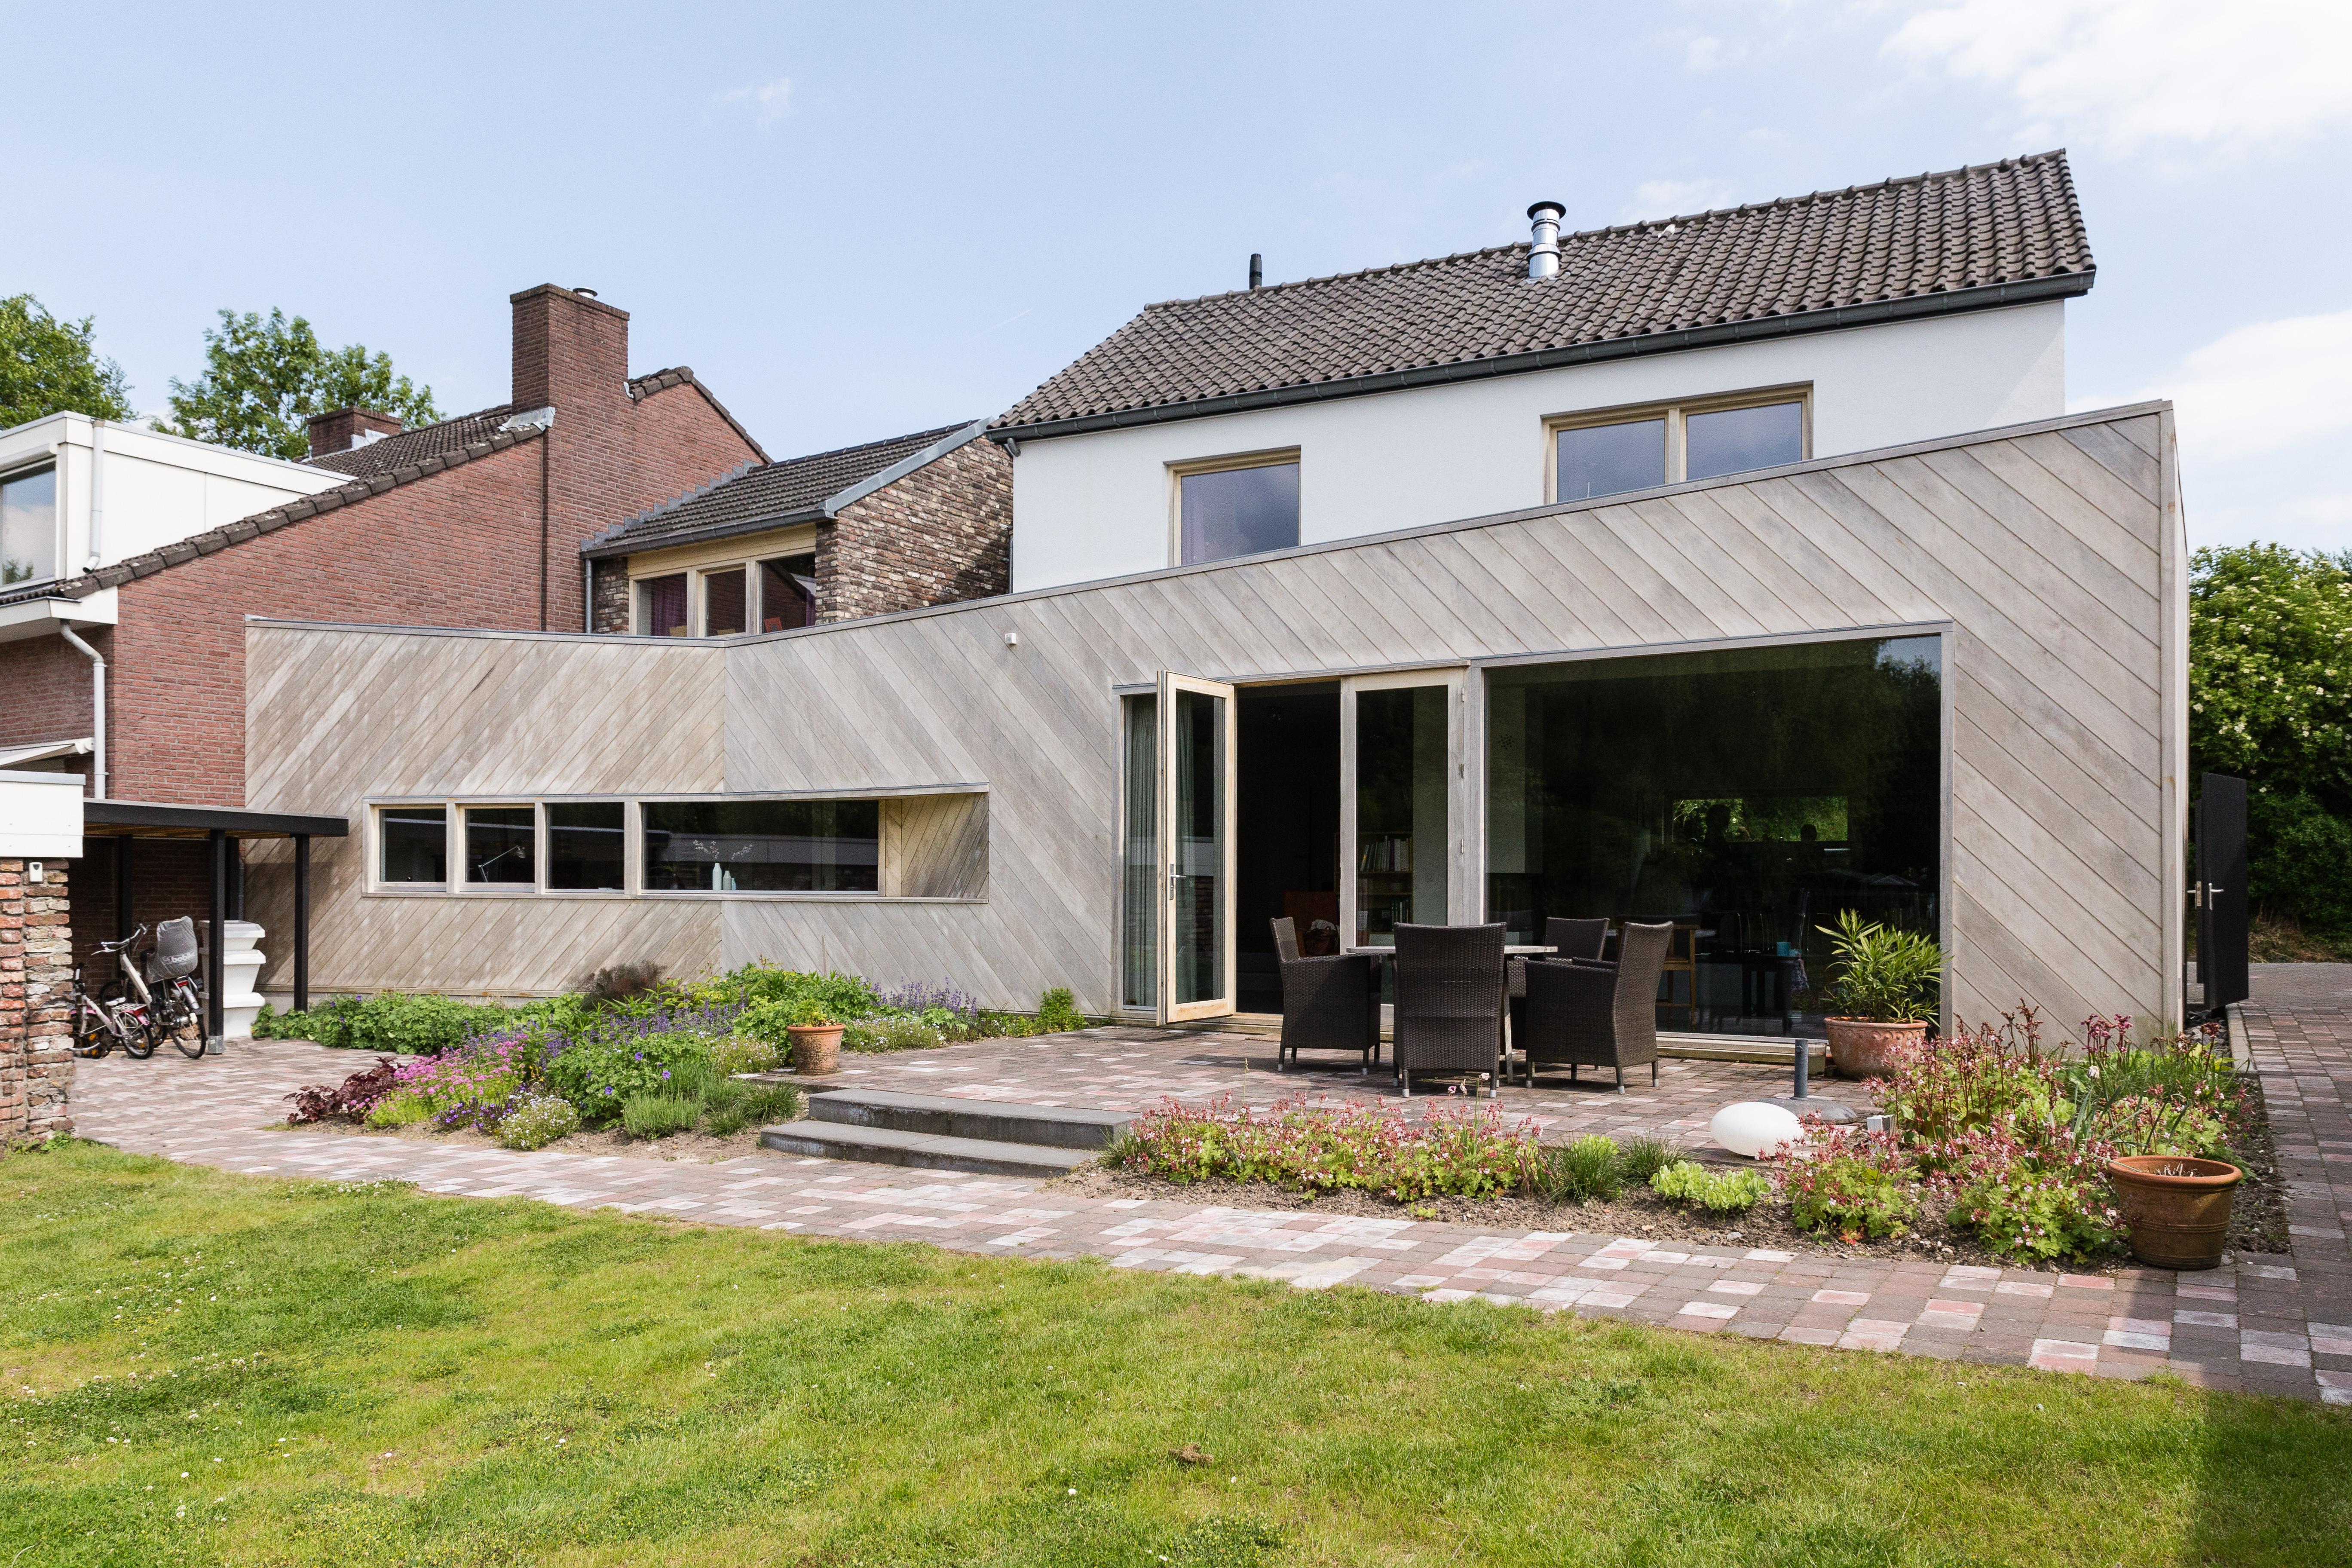 Garden housing design large windows